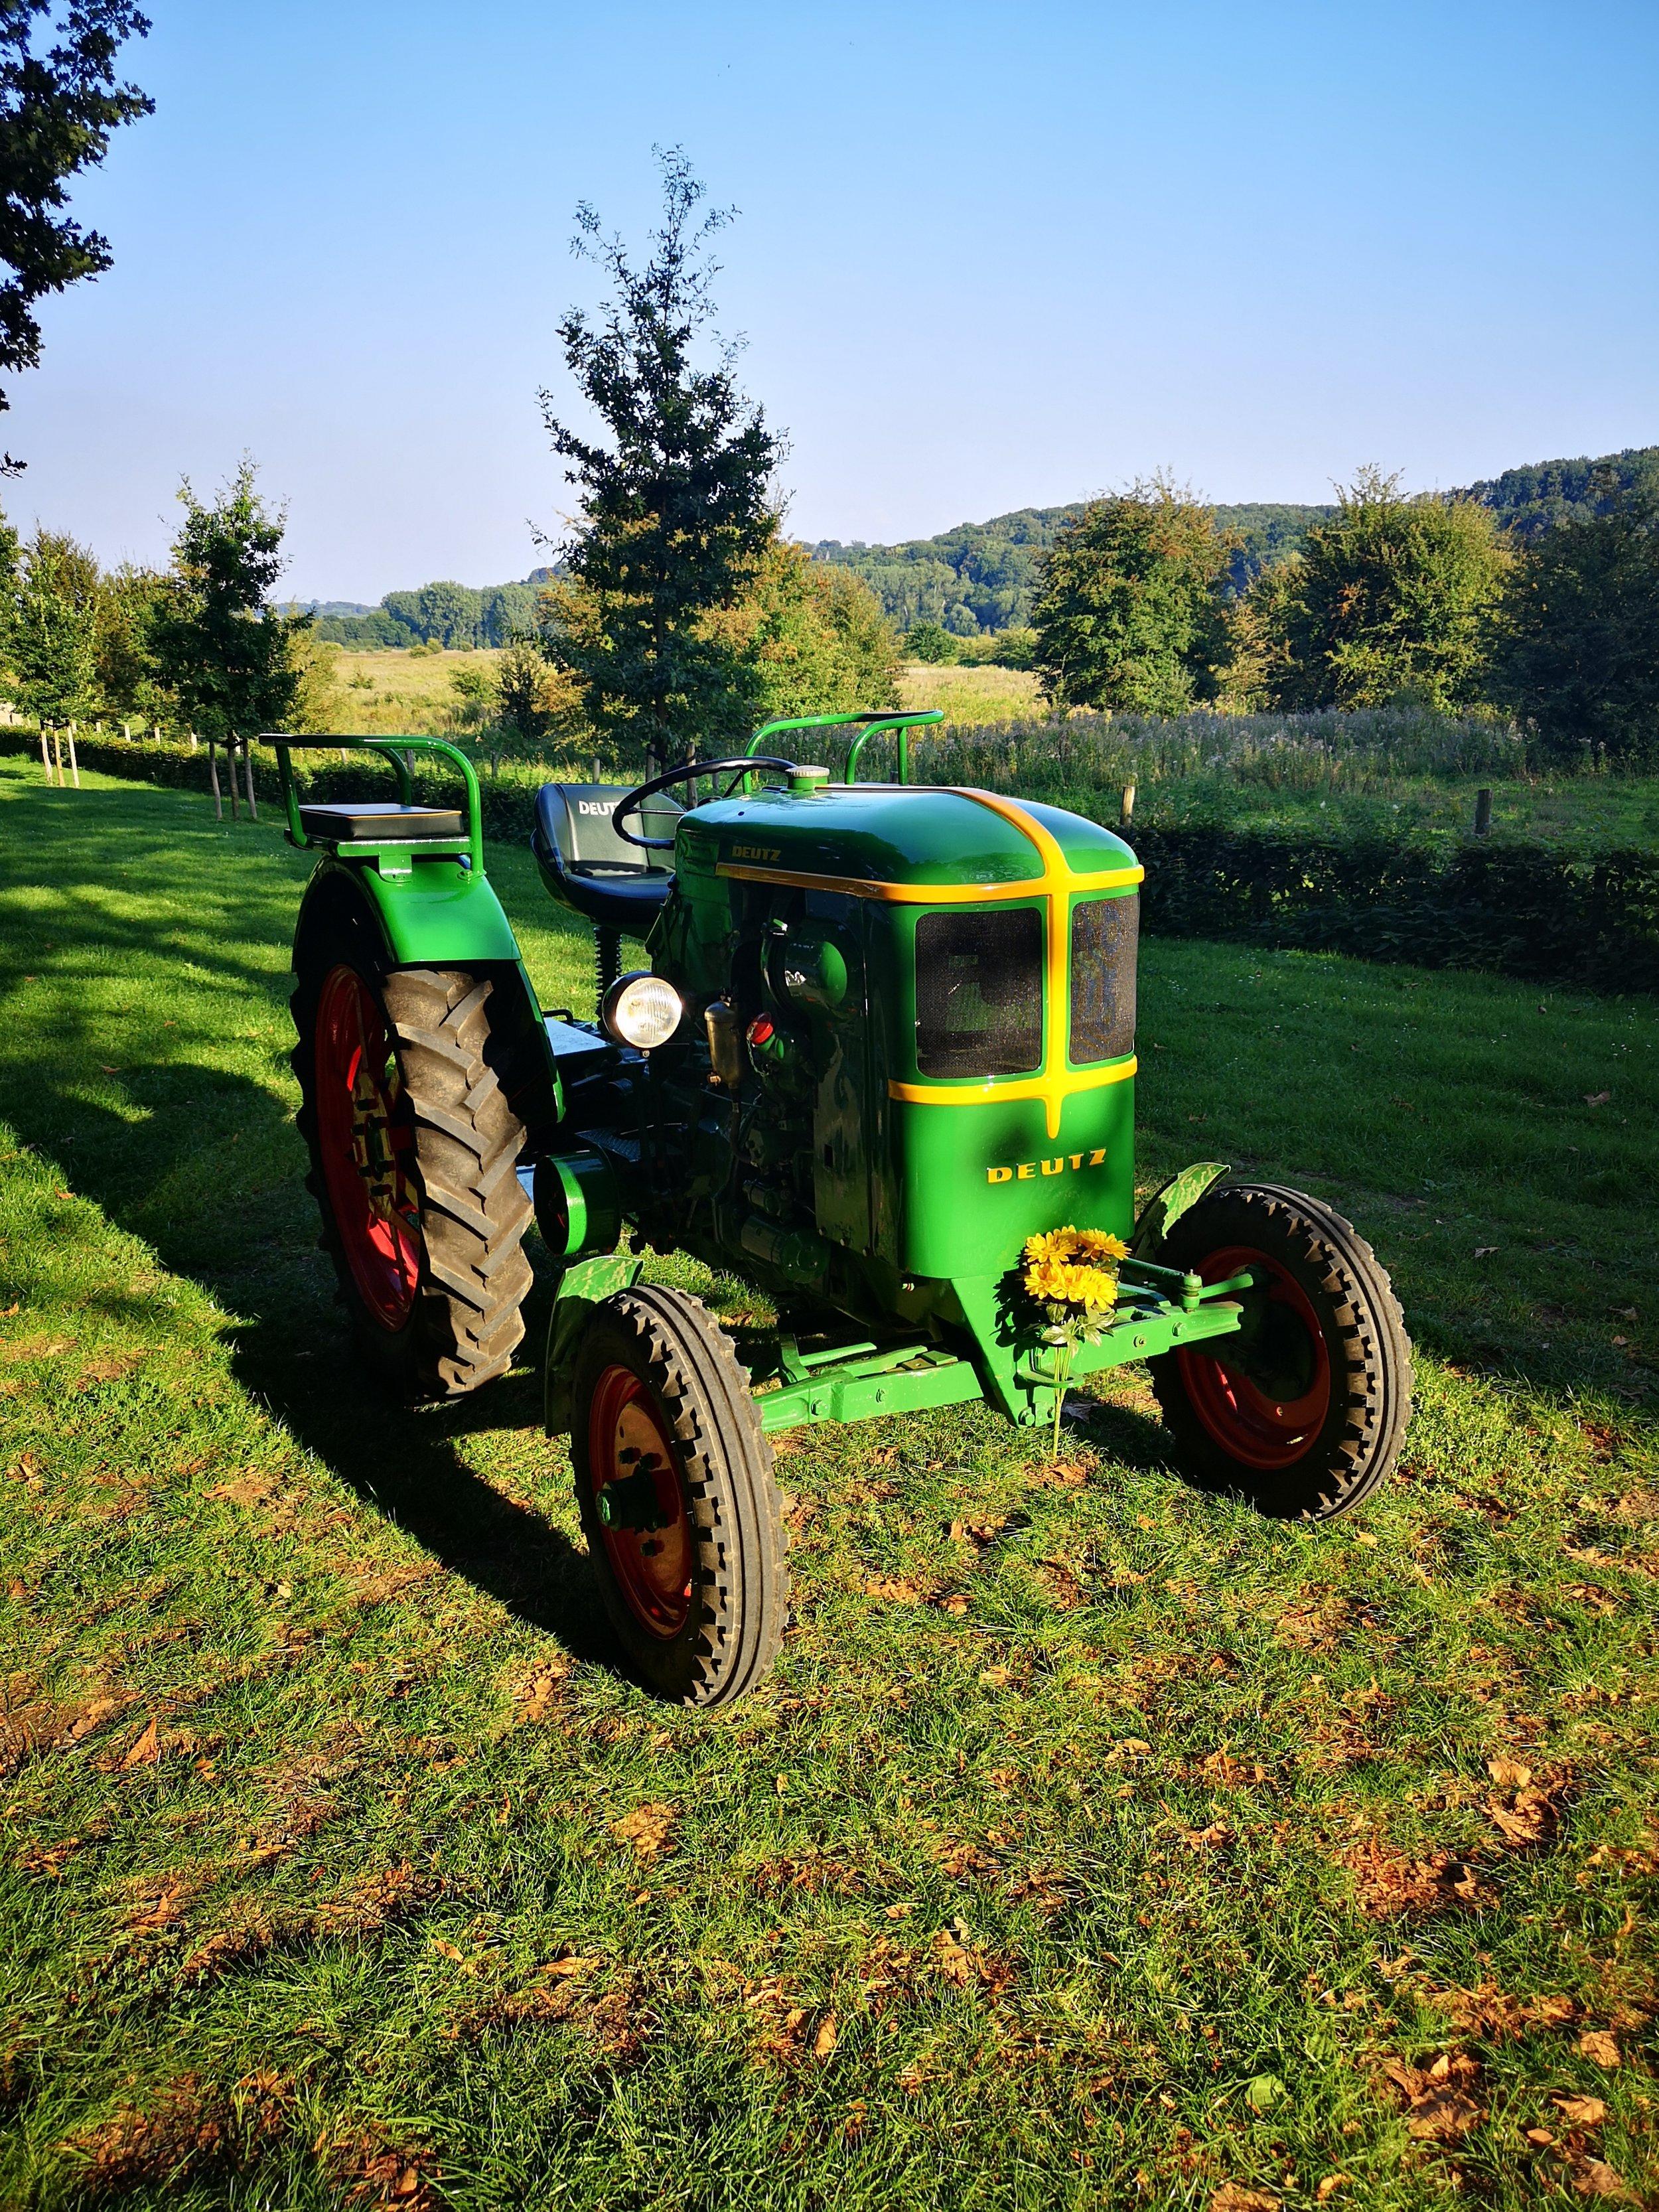 Vintage Deutz tractor